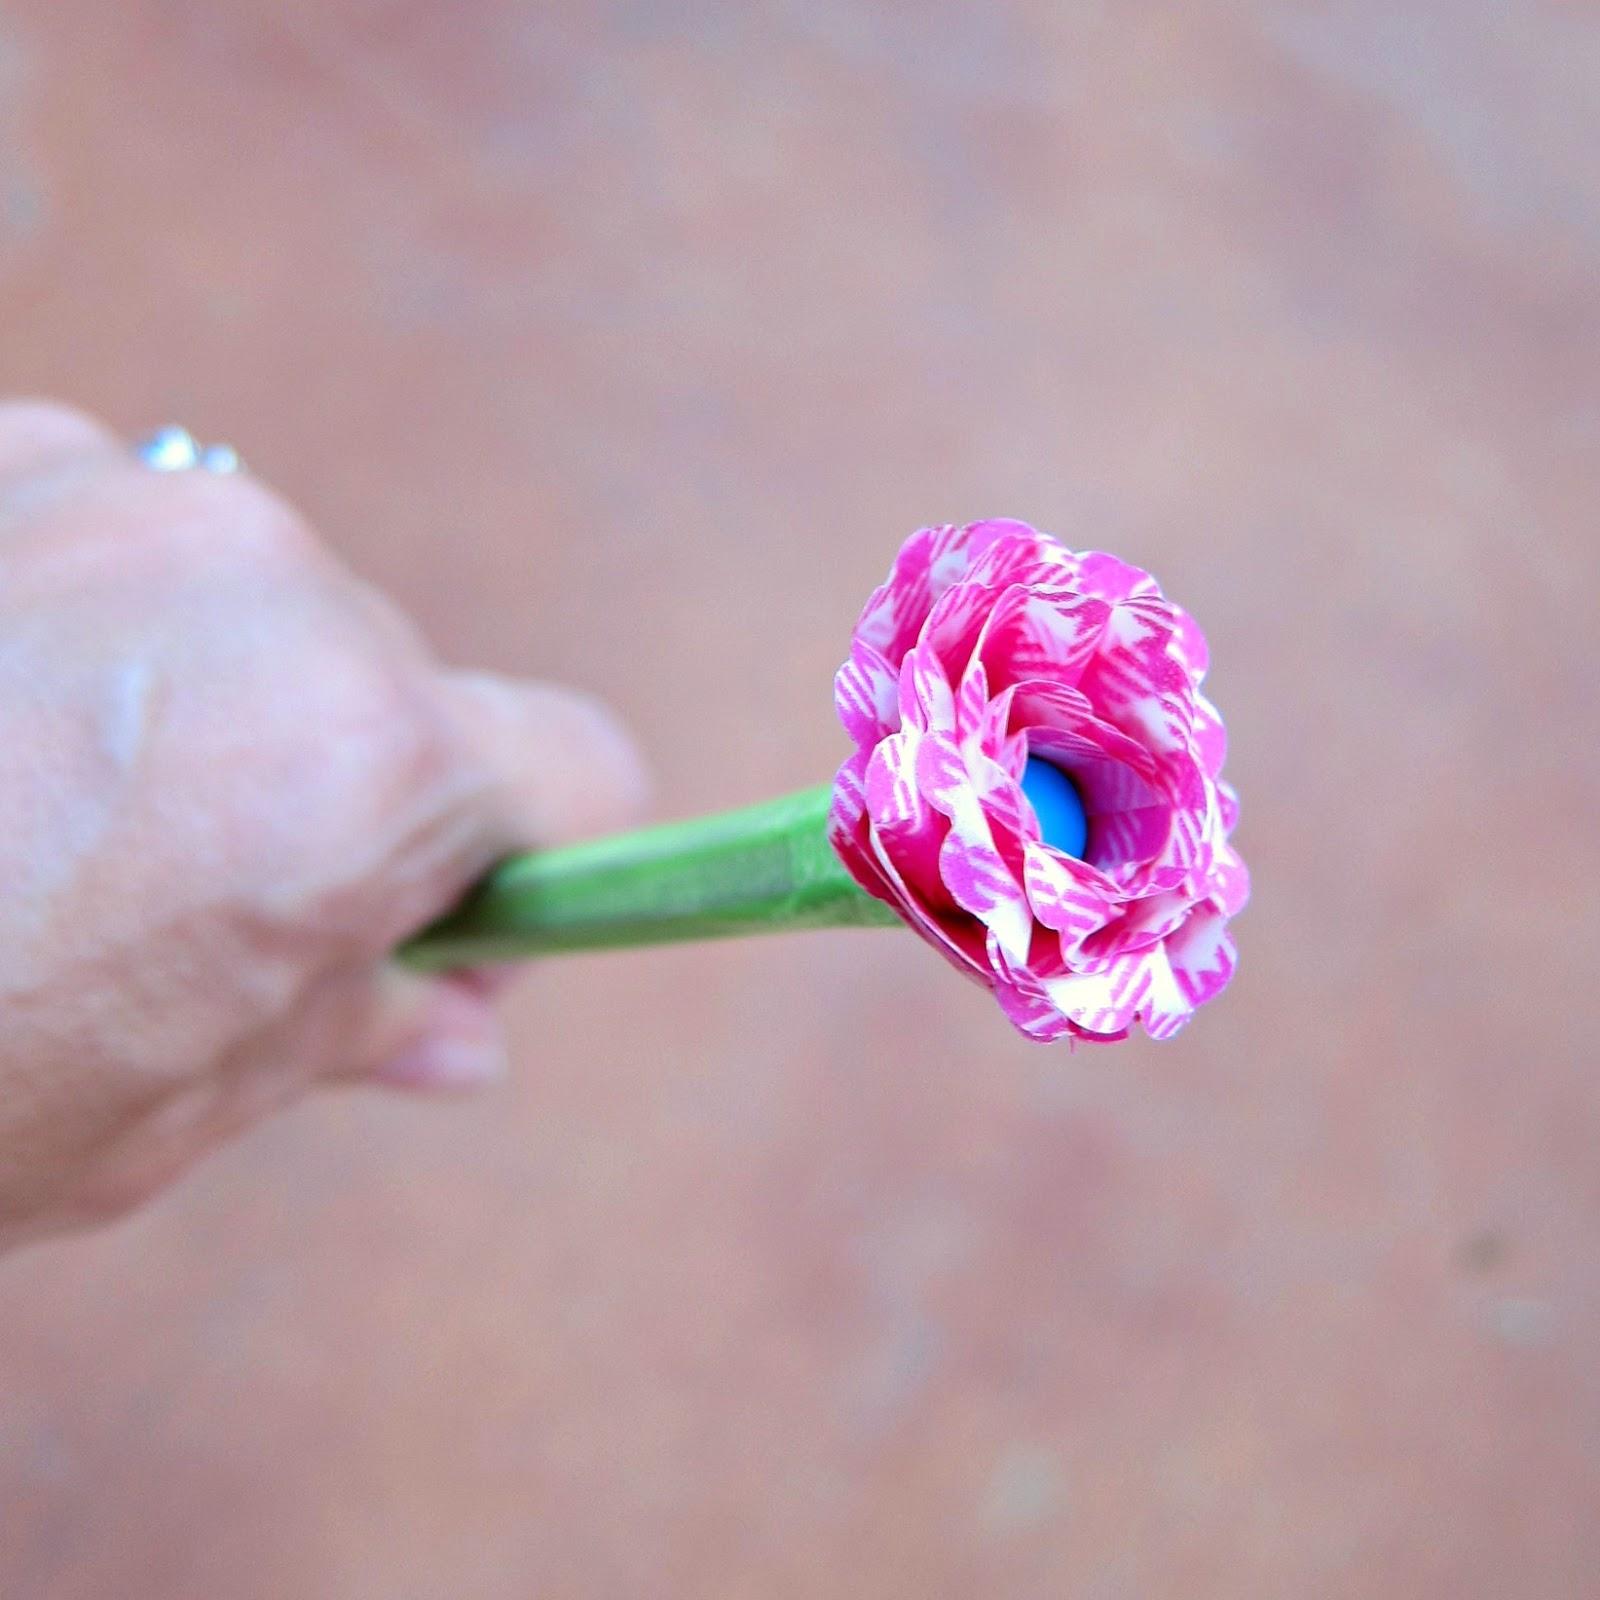 CAKEWashi Tape Flower PensOne Artsy Mama